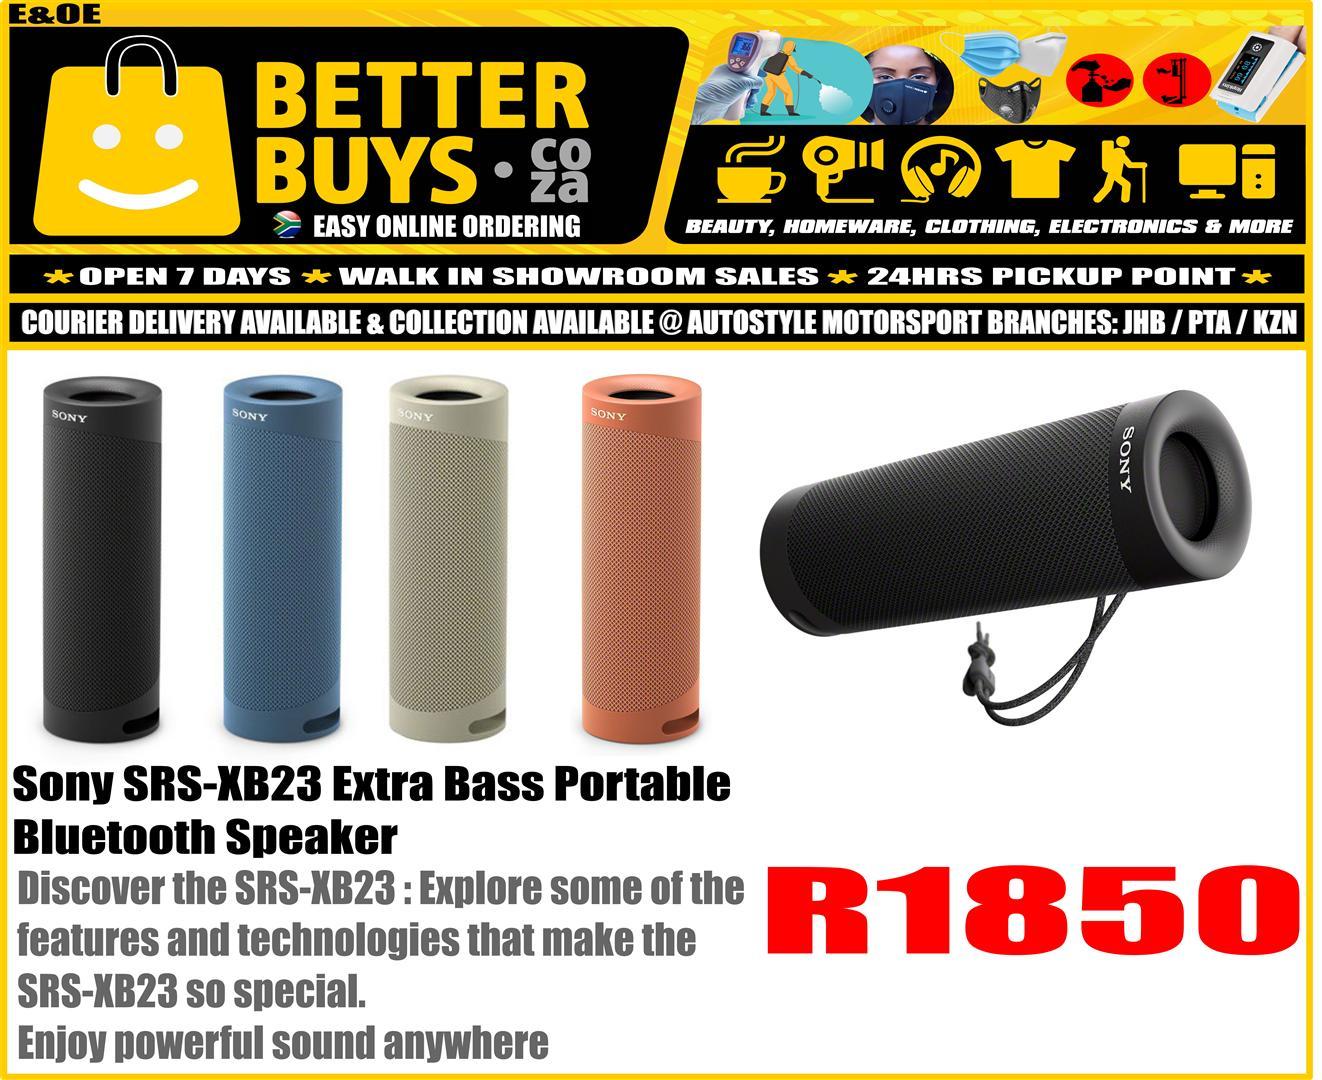 Sony SRS-XB23 Extra Bass Portable Bluetooth Speaker - Similar to JBL FLIP